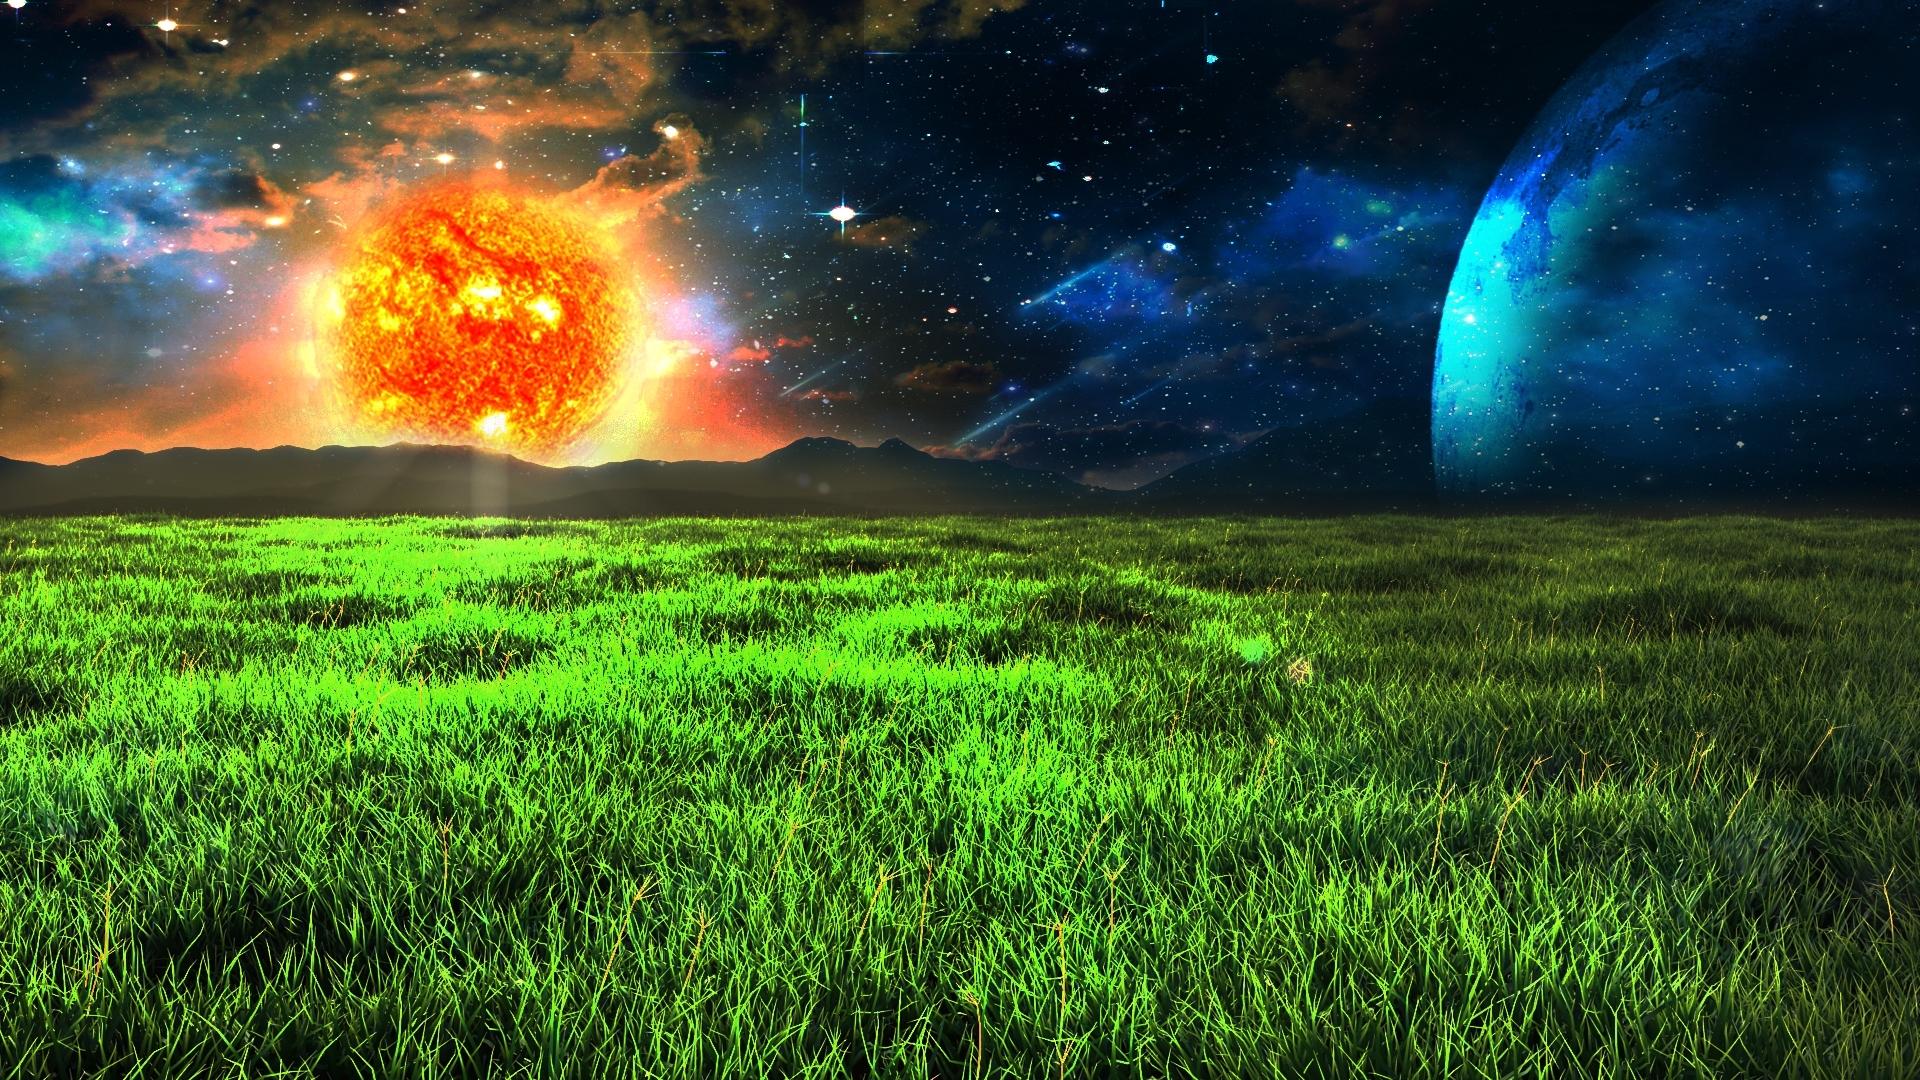 студии картинки на обои природа космос иммунологи, неонатологи